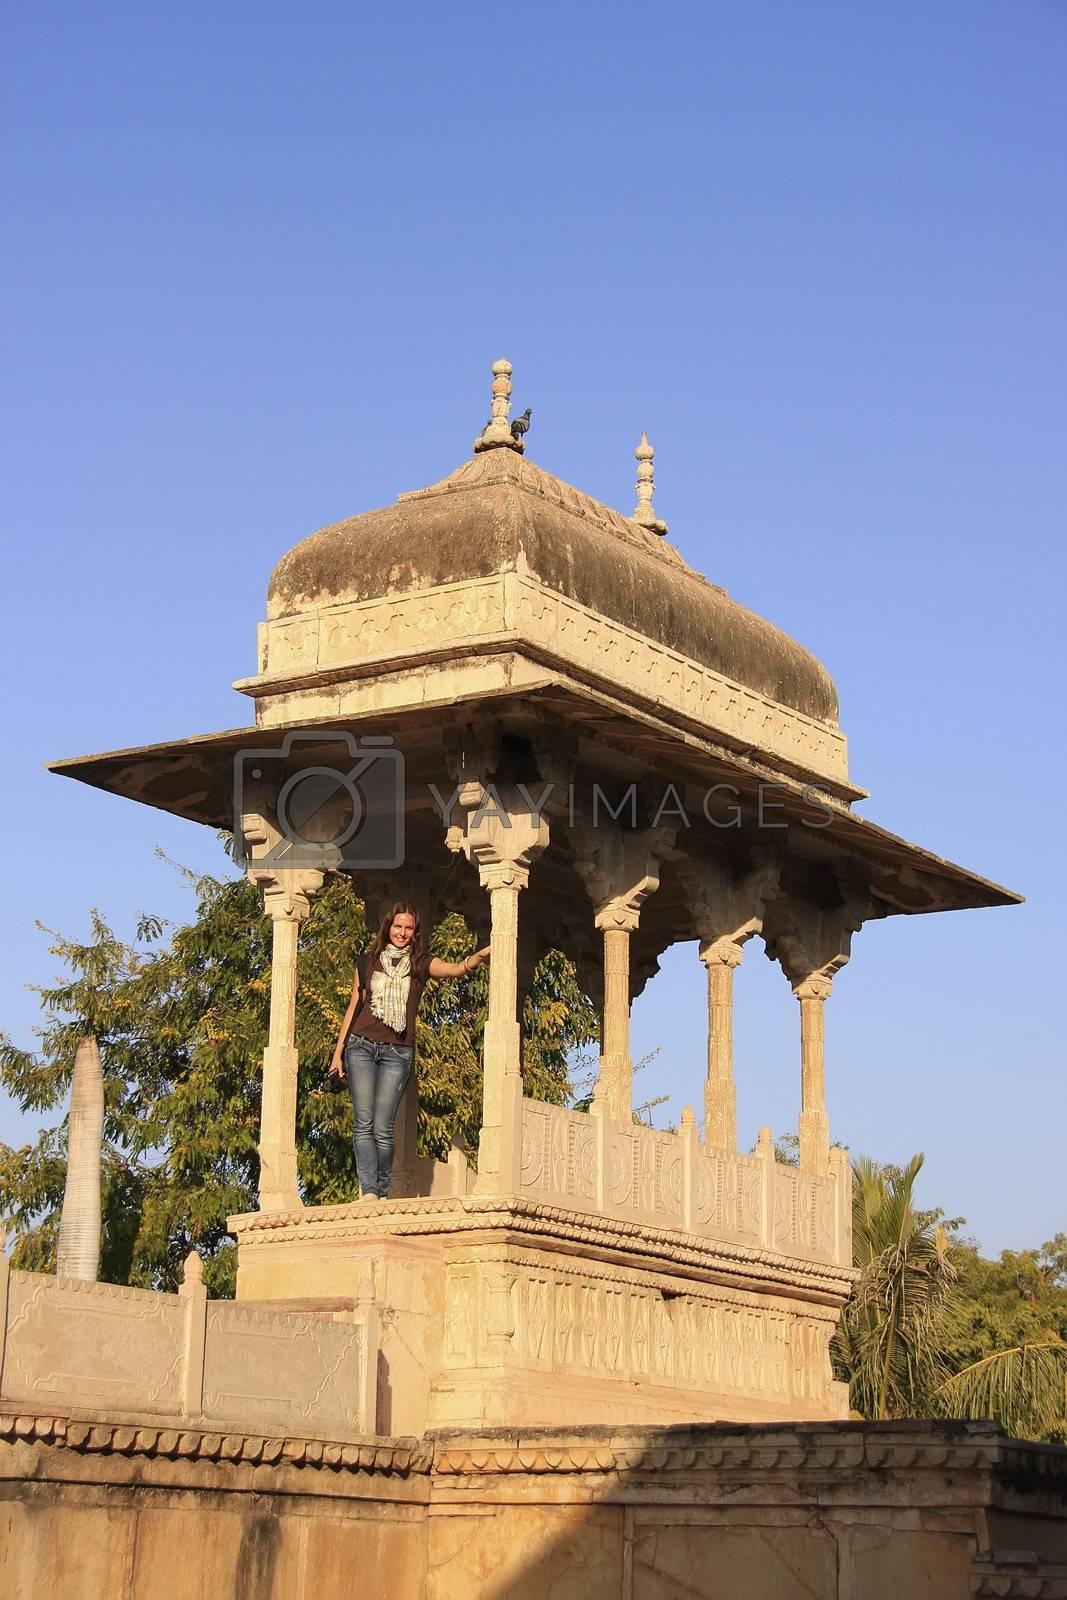 Young woman standing at Raniji ki Baori, Bundi, Rajasthan, India